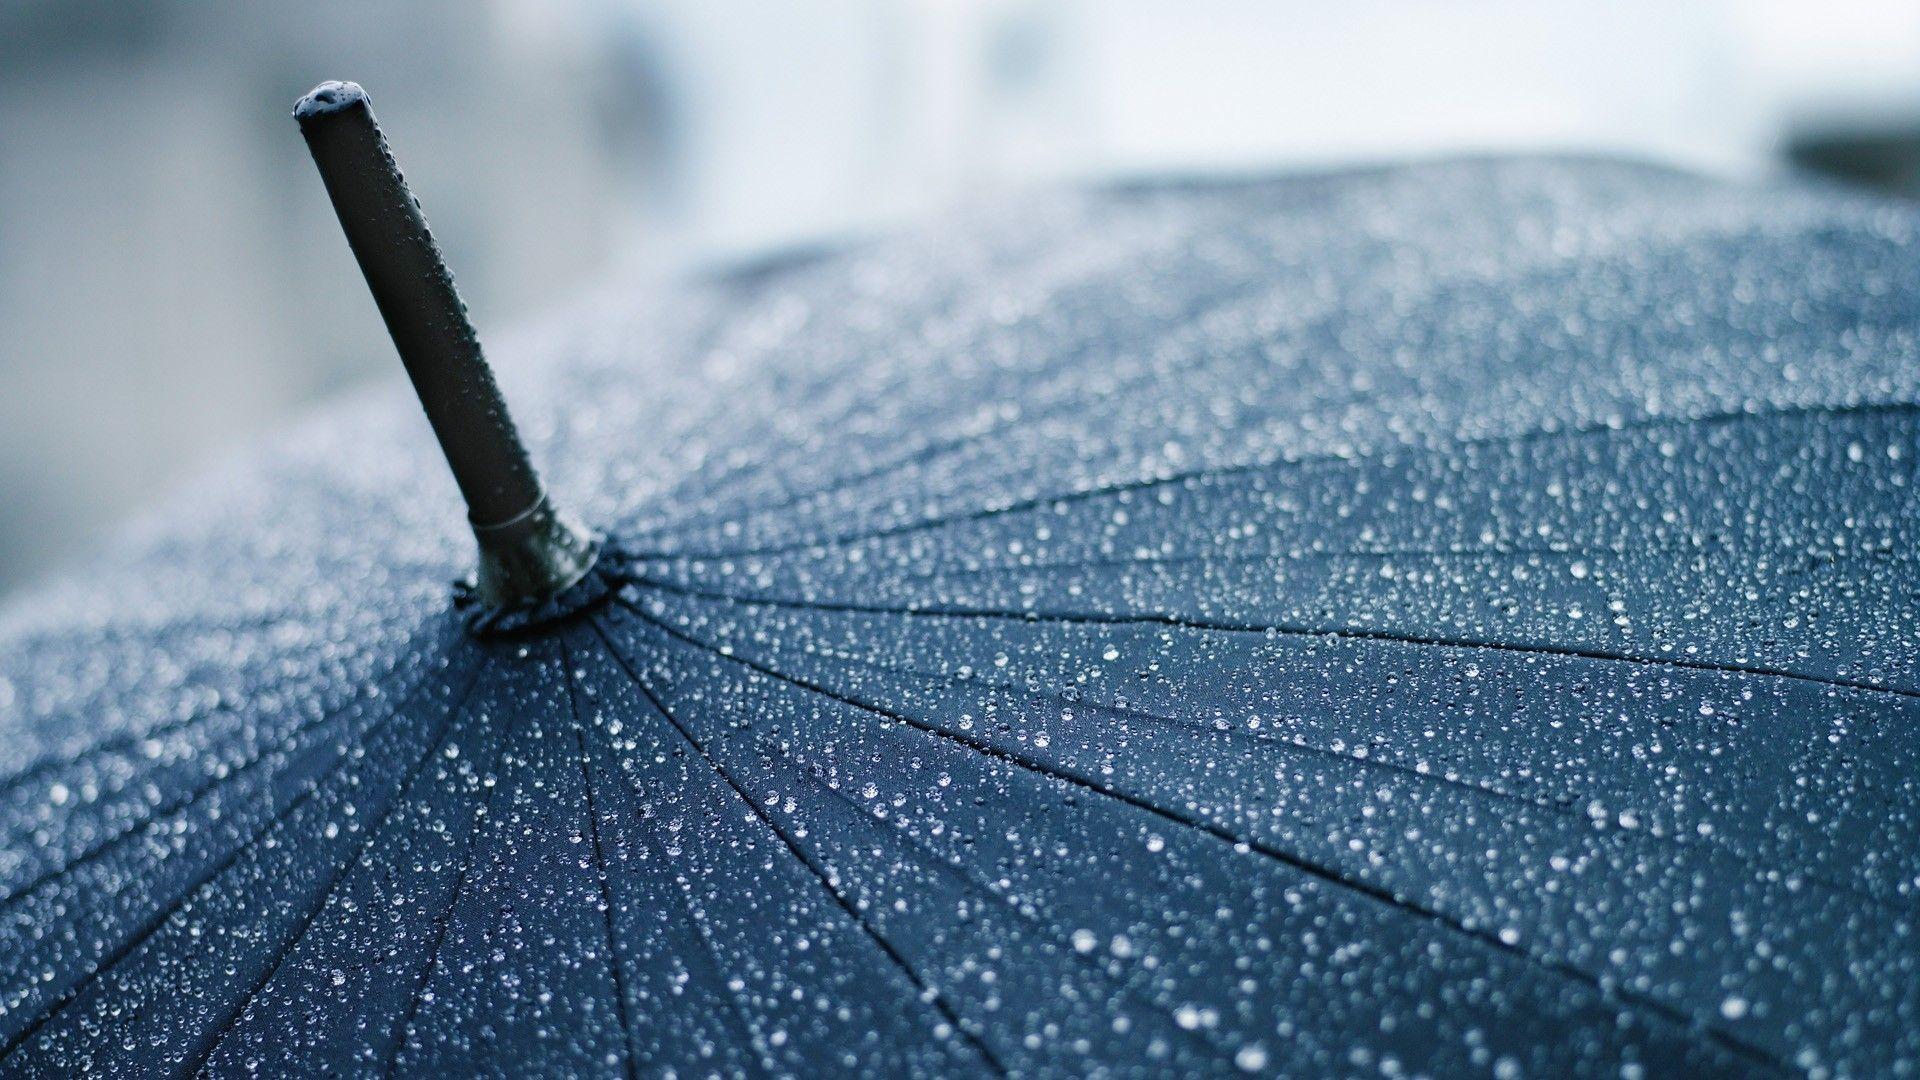 Hd wallpaper rain - Under Rain Wallpaper Hd